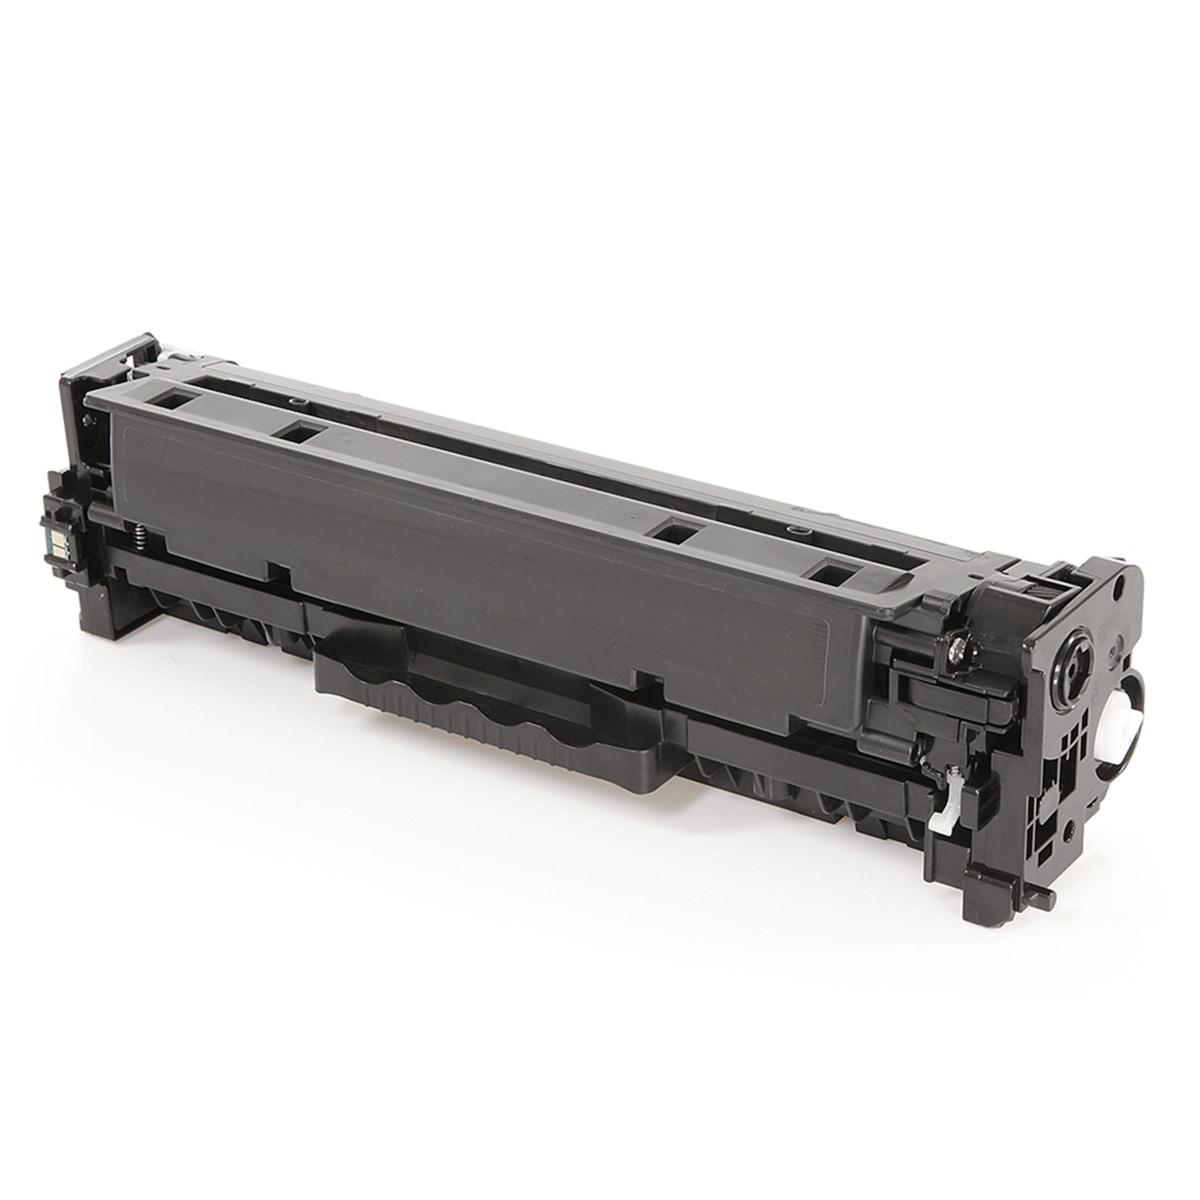 Toner Compatível com HP CF380X 80X 312X Preto | M476 M476DW M476NW | Chinamate 4.4k